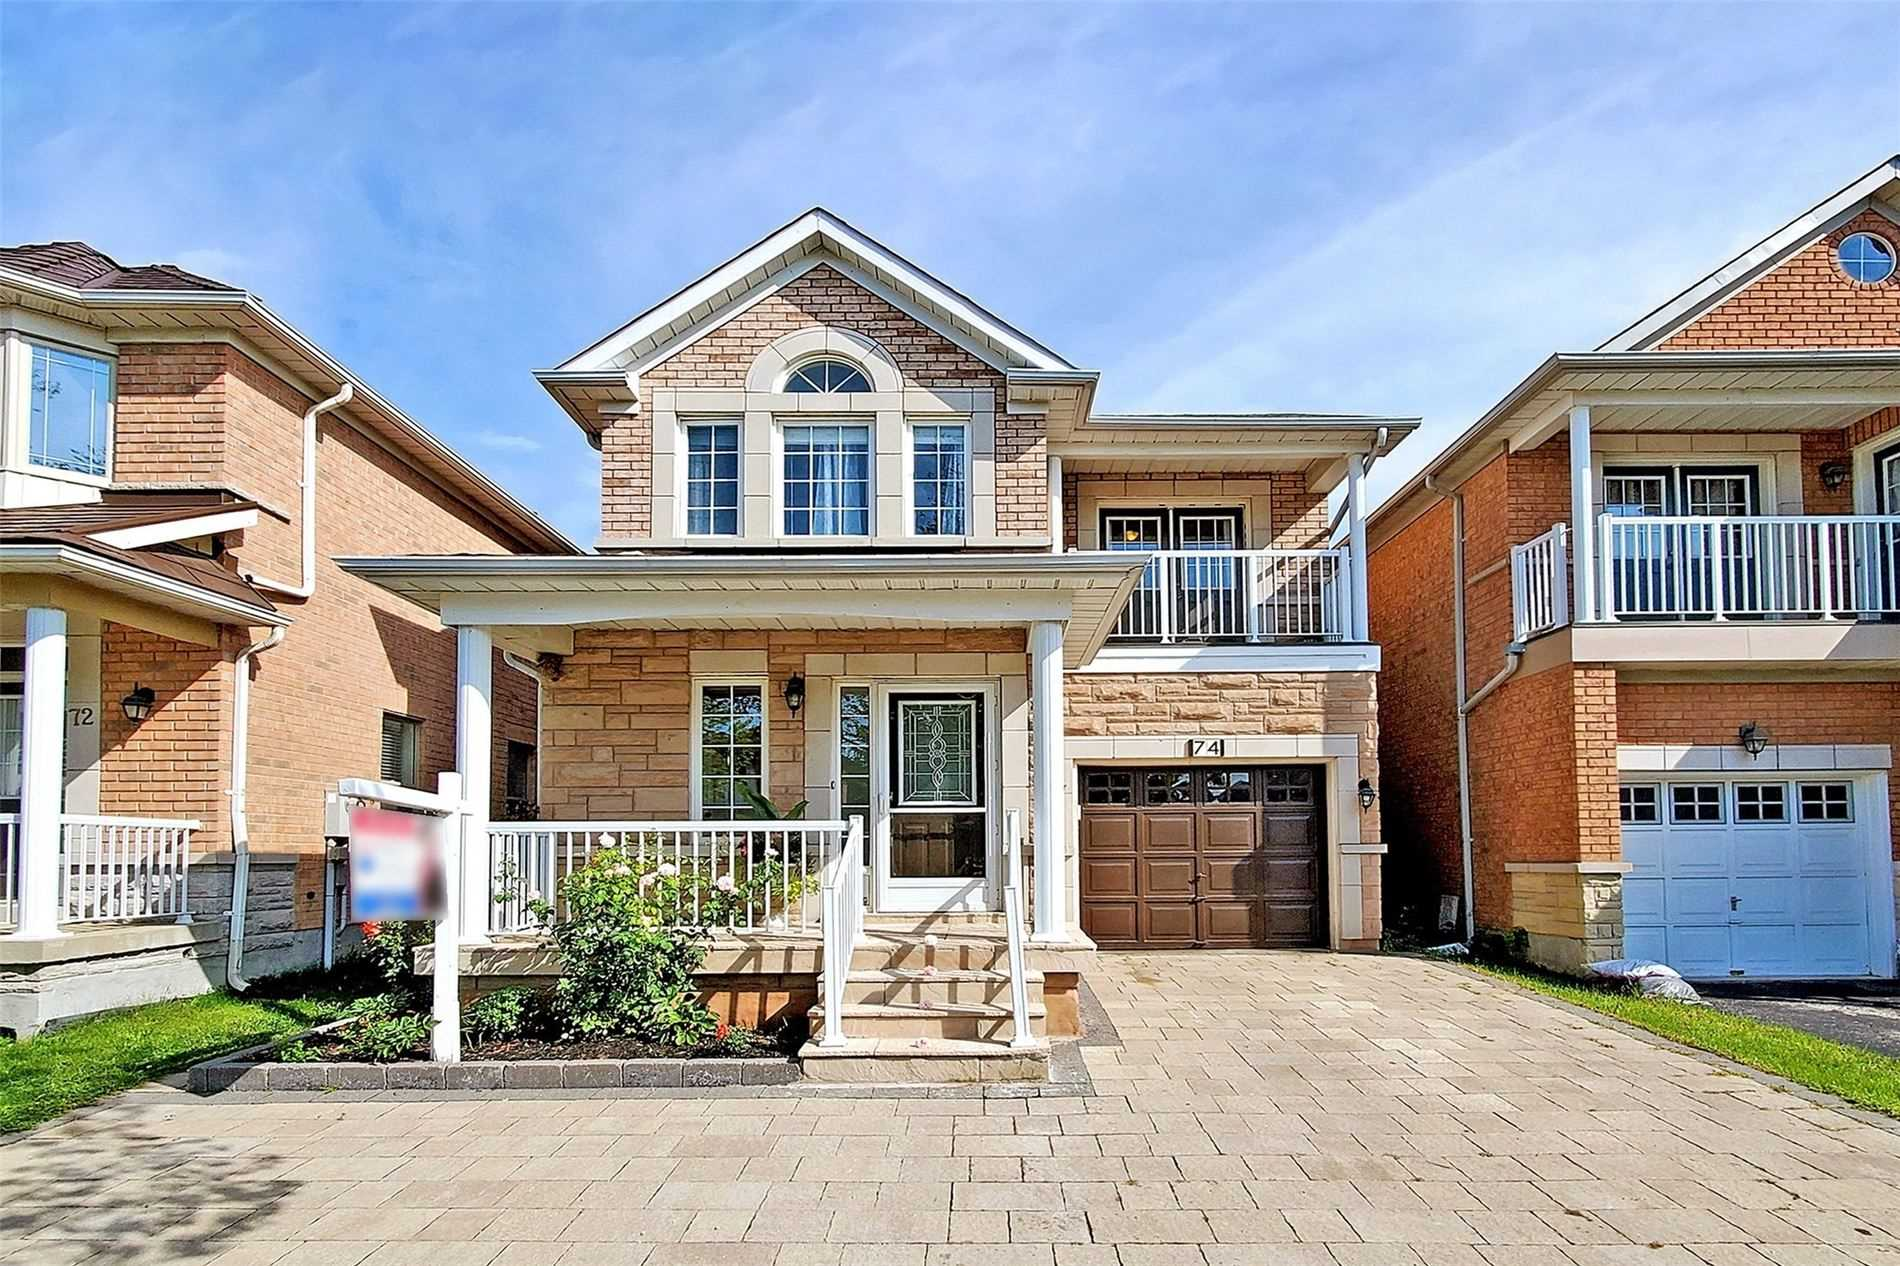 Detached house For Sale In Markham - 74 Warren Bradley St, Markham, Ontario, Canada L6C2X4 , 3 Bedrooms Bedrooms, ,4 BathroomsBathrooms,Detached,For Sale,Warren Bradley